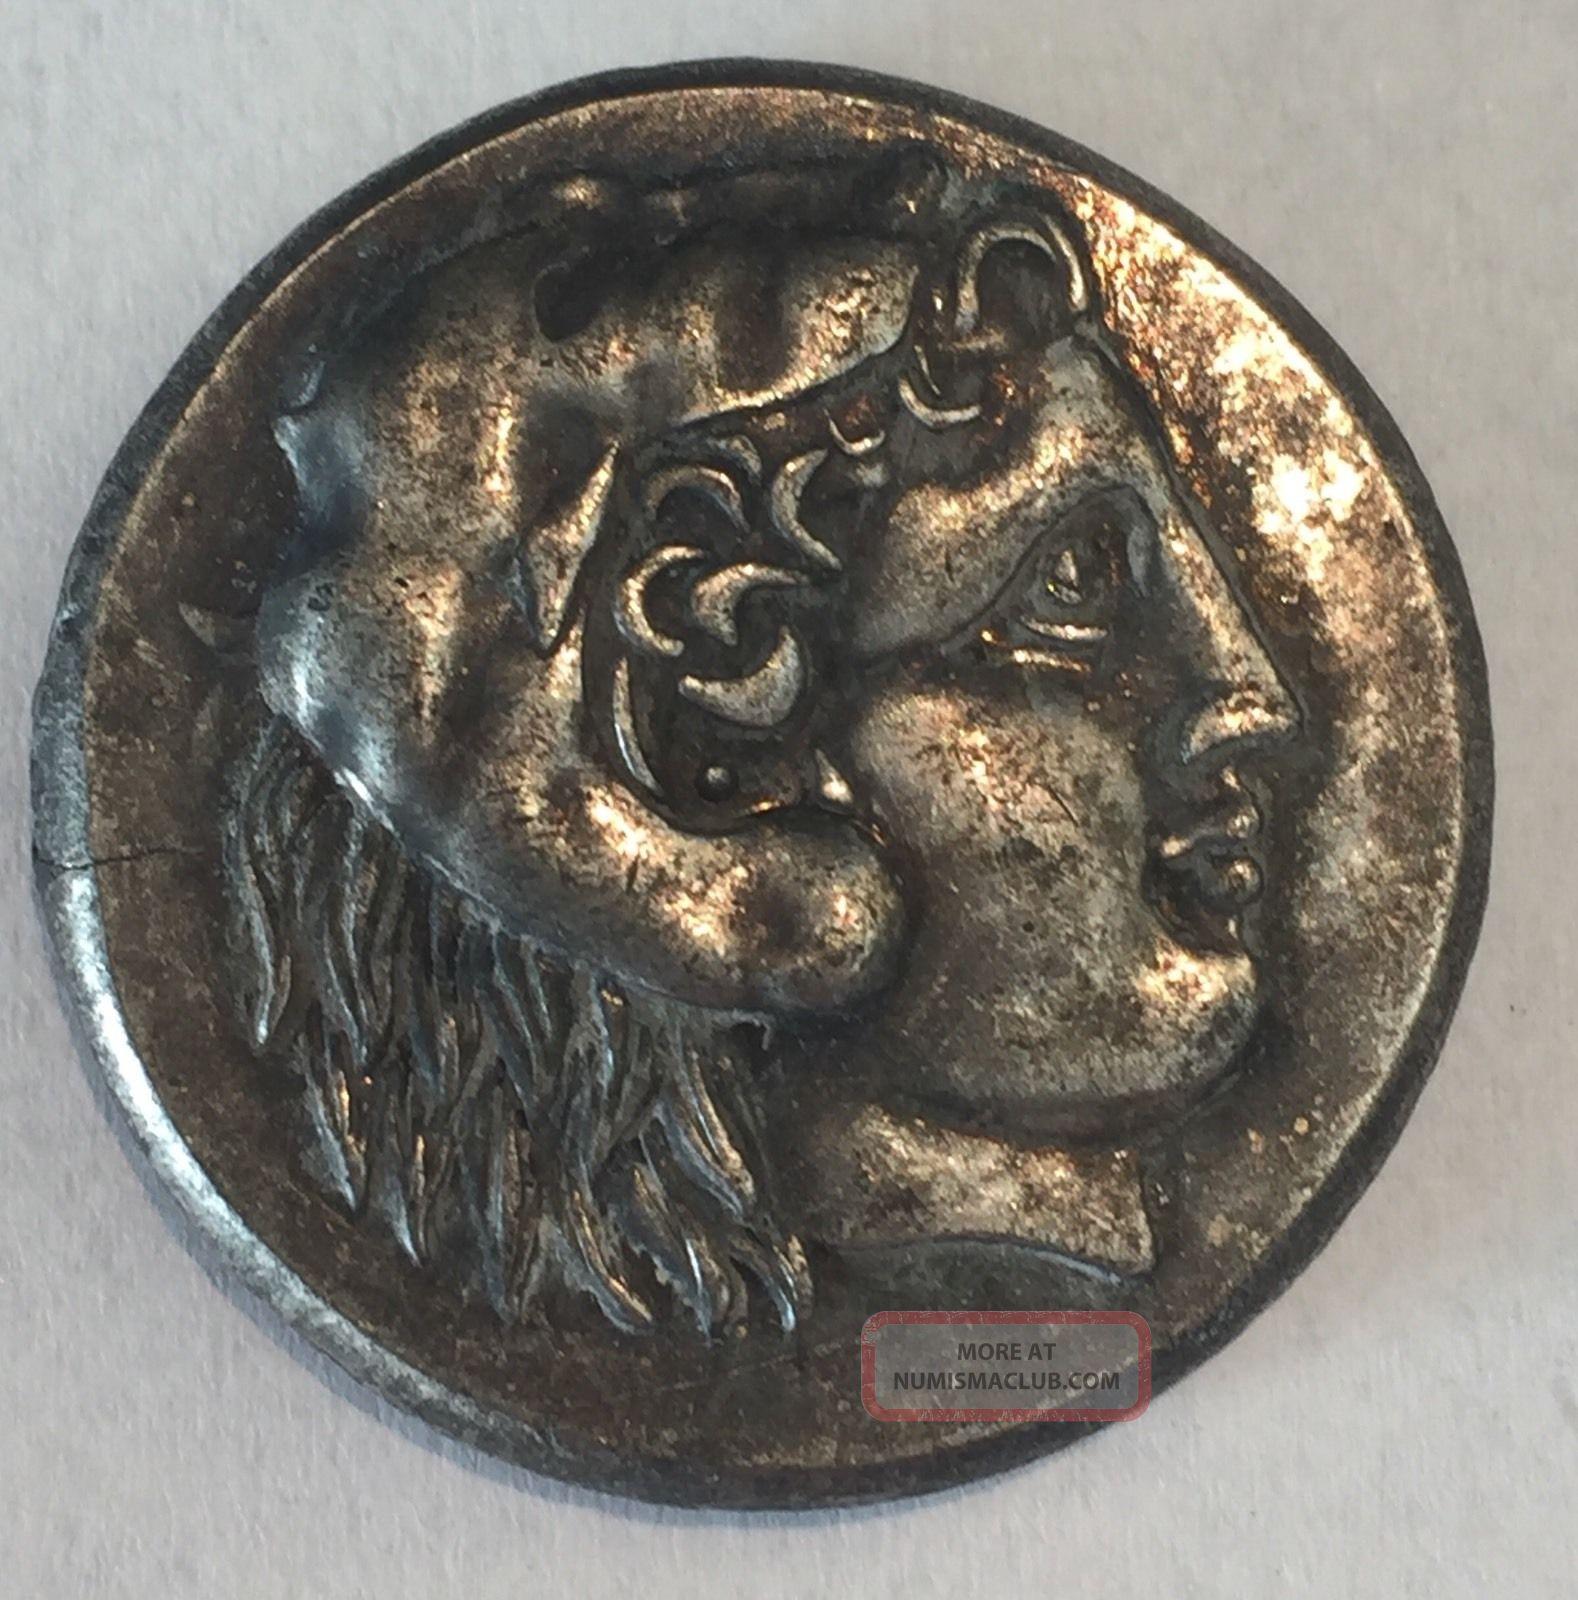 Ancient Greece Tetradrachma 250 Bc Coin Herakles Crab In ...